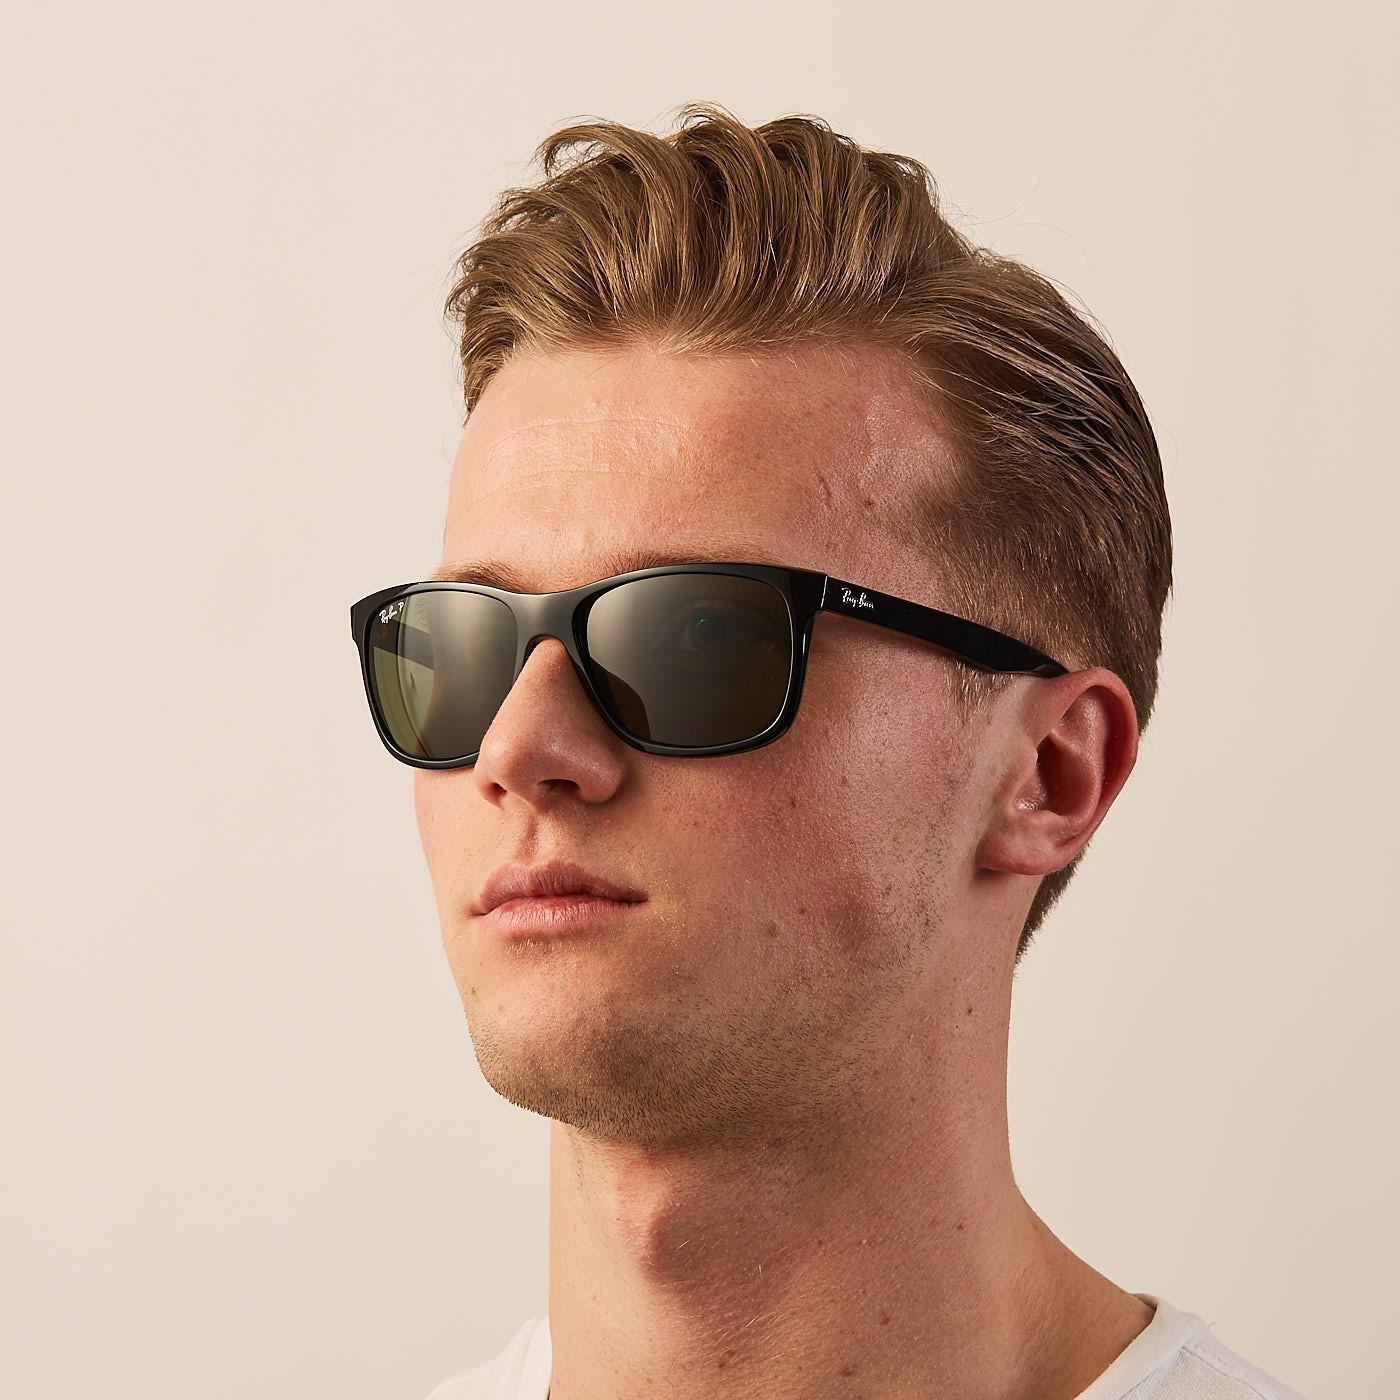 bce4447e23 Ray-Ban Highstreet Shiny Black Polarized Sunglasses RB4181 601/9A -  Sunglasses